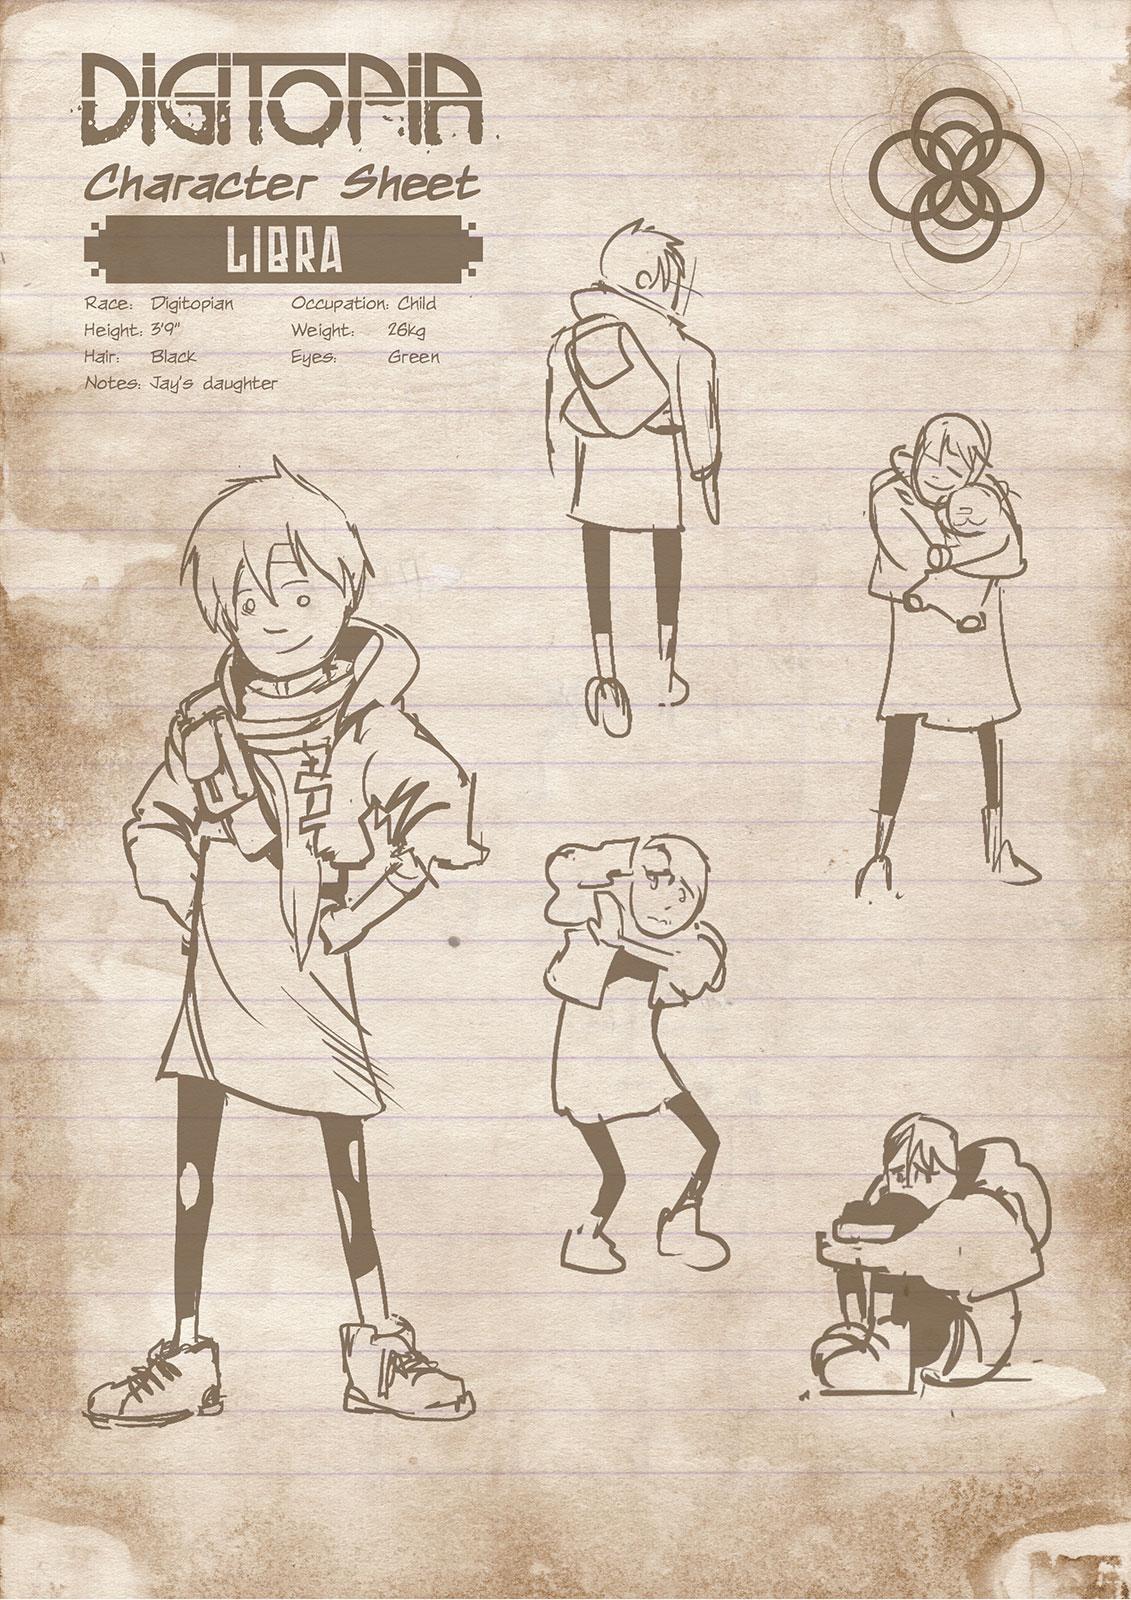 Digitopia-Character-Sheet-02-Libra